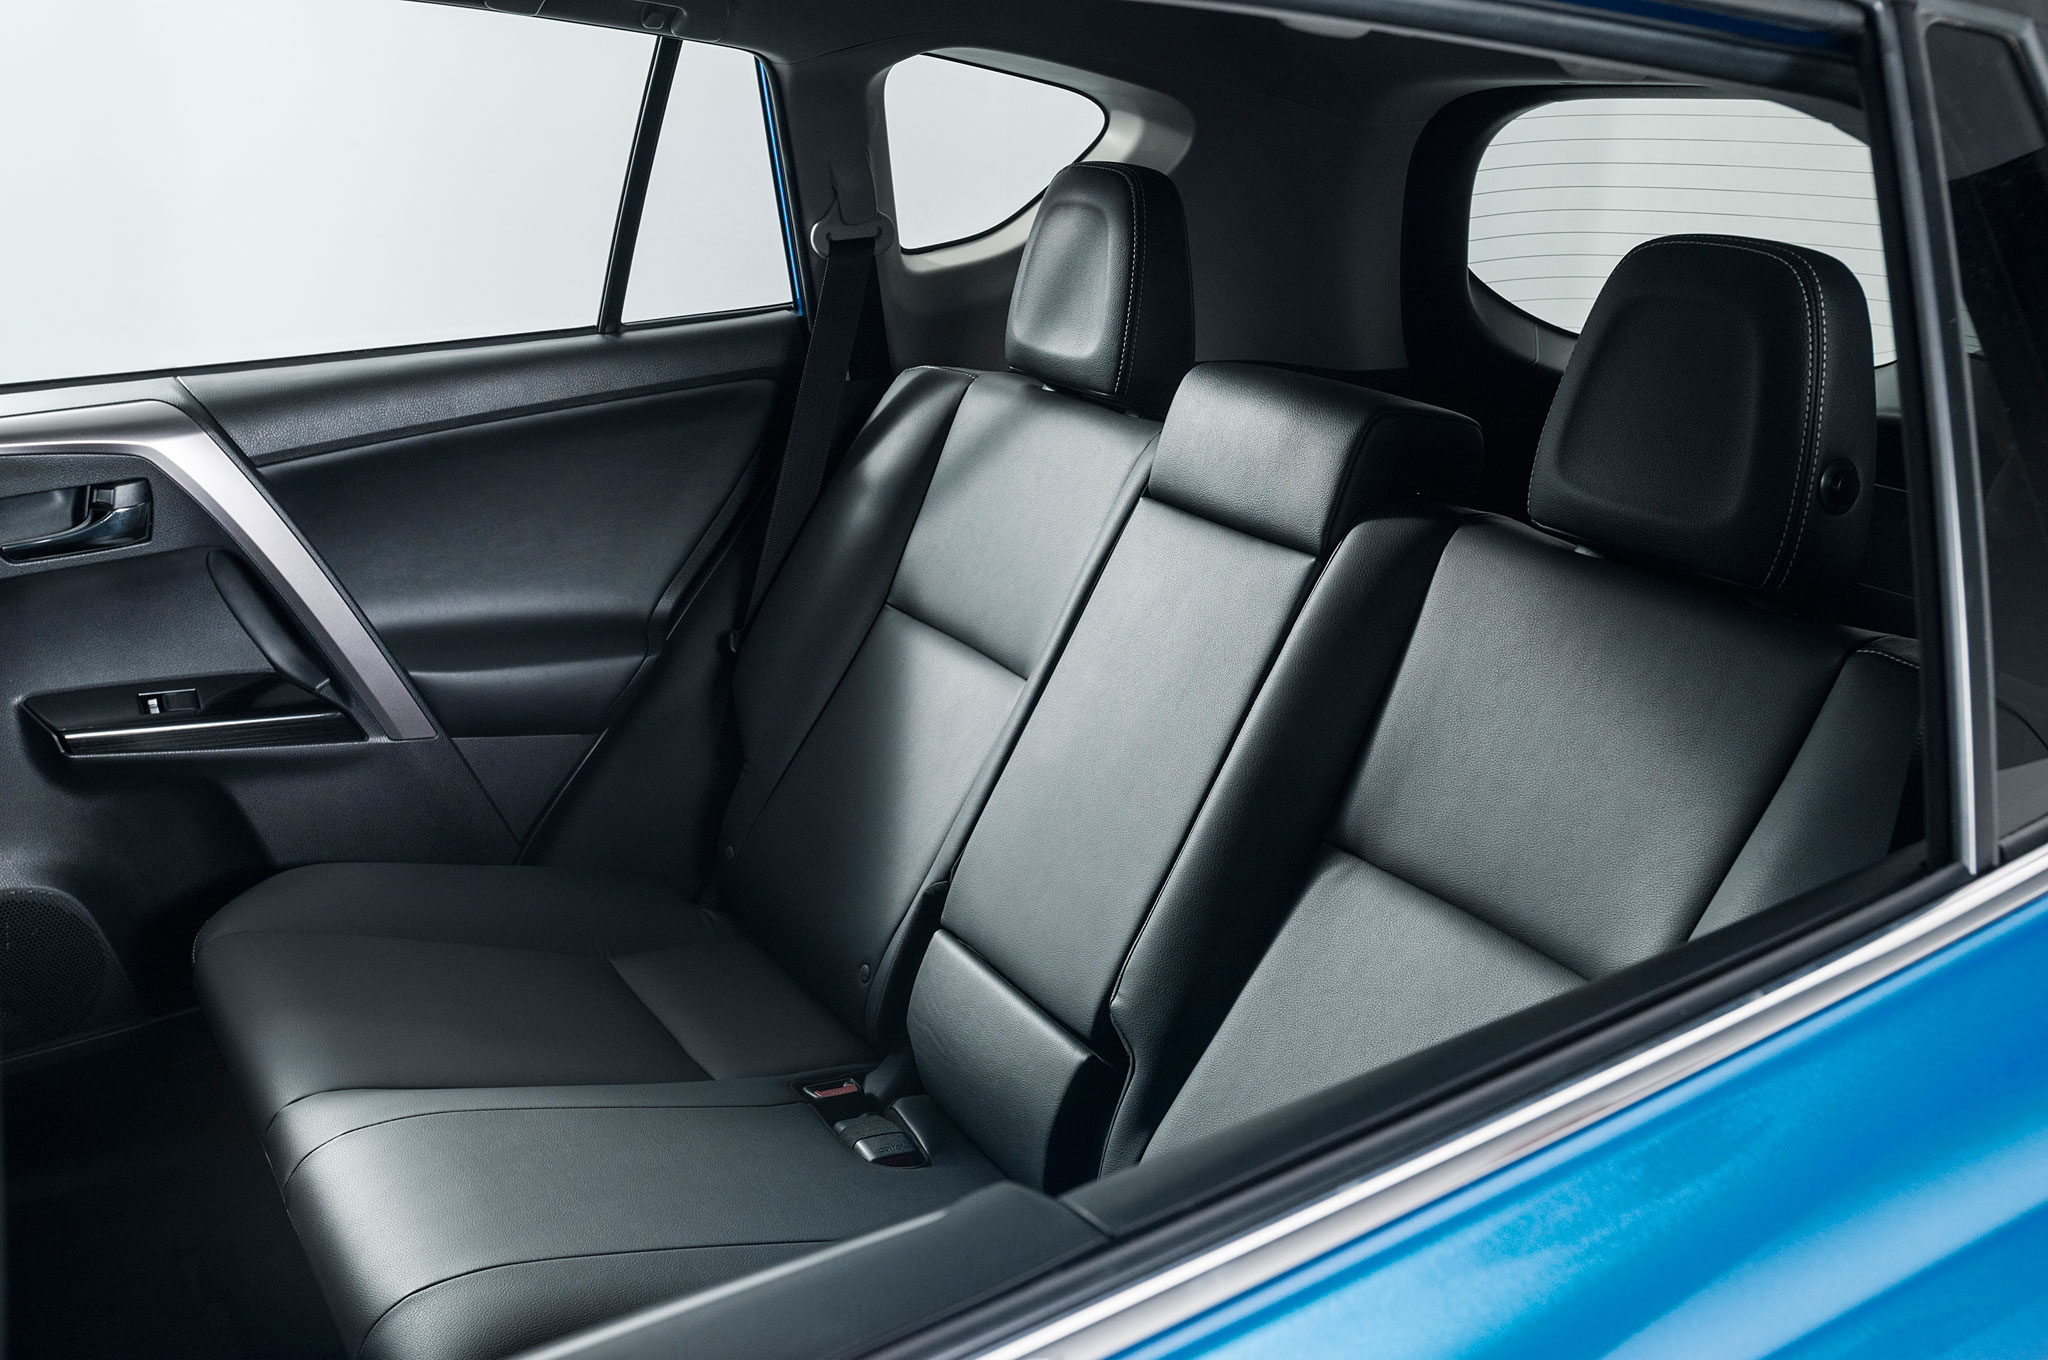 https://st.automobilemag.com/uploads/sites/11/2015/11/2016-Toyota-RAV4-Hybrid-rear-seat.jpg